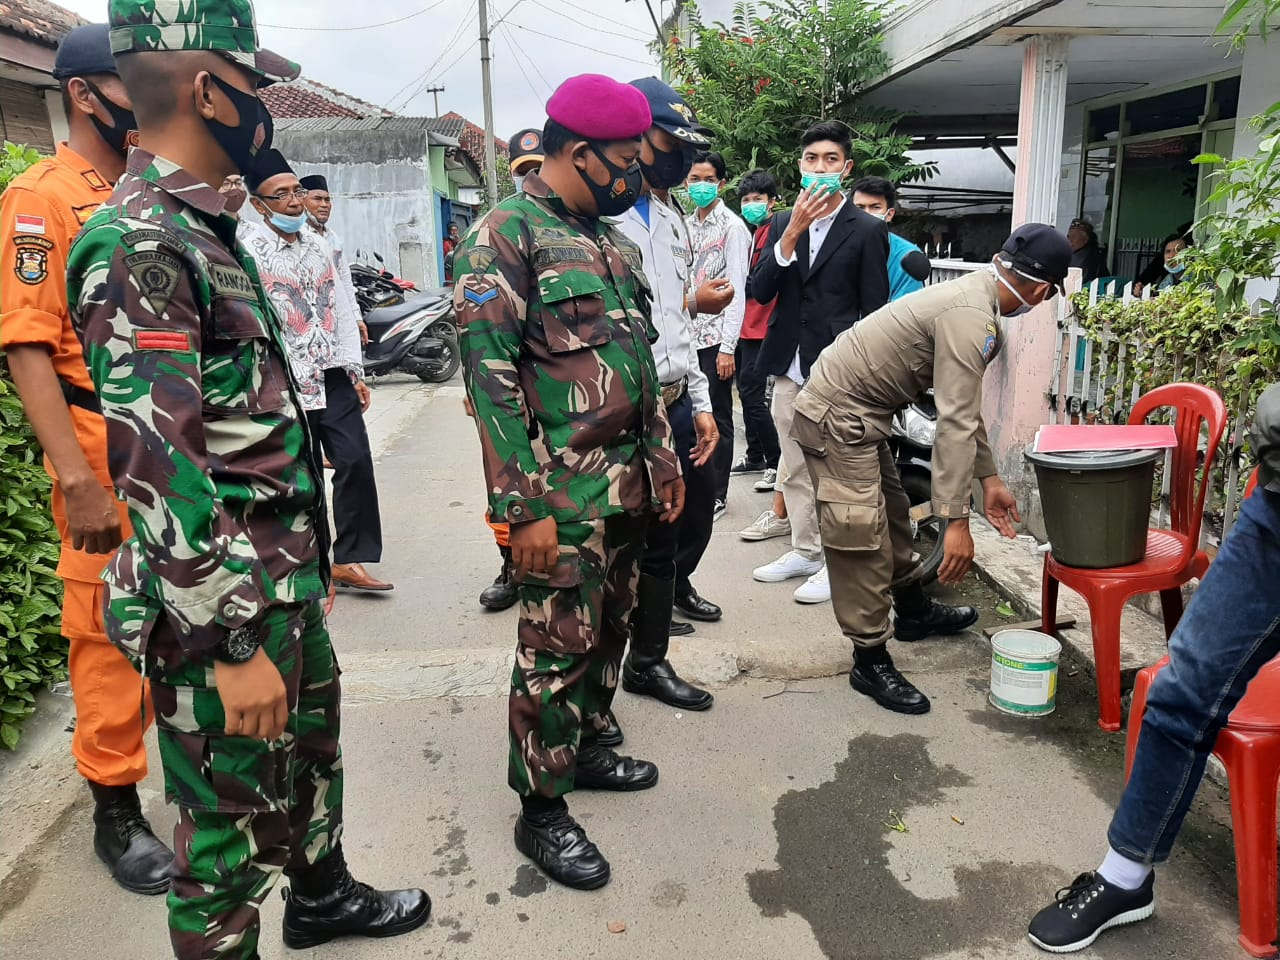 Babinsa Koramil 410-04TKT Kodim 0410KBL Pelda Sutiyono bersama dengan Tim 2 Gugus Tugas Penanganan Covid-19 menyambangi lokasi hajatan di wilayah kecamatan Way Halim